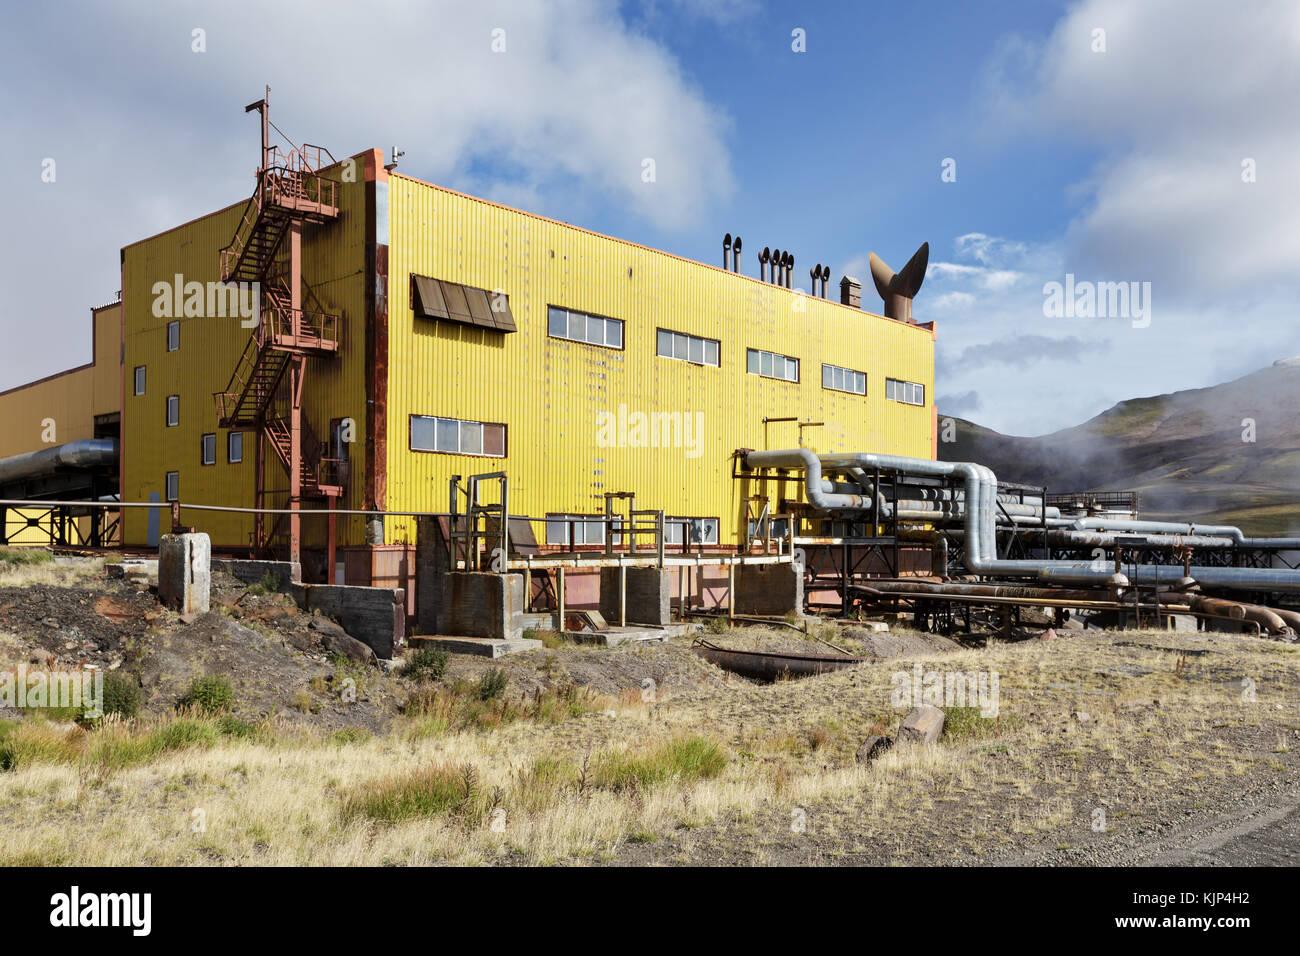 Separator and pumping station of Mutnovskaya Geothermal Power Station (Mutnovskaya GeoPP-1) using geothermal energy - Stock Image